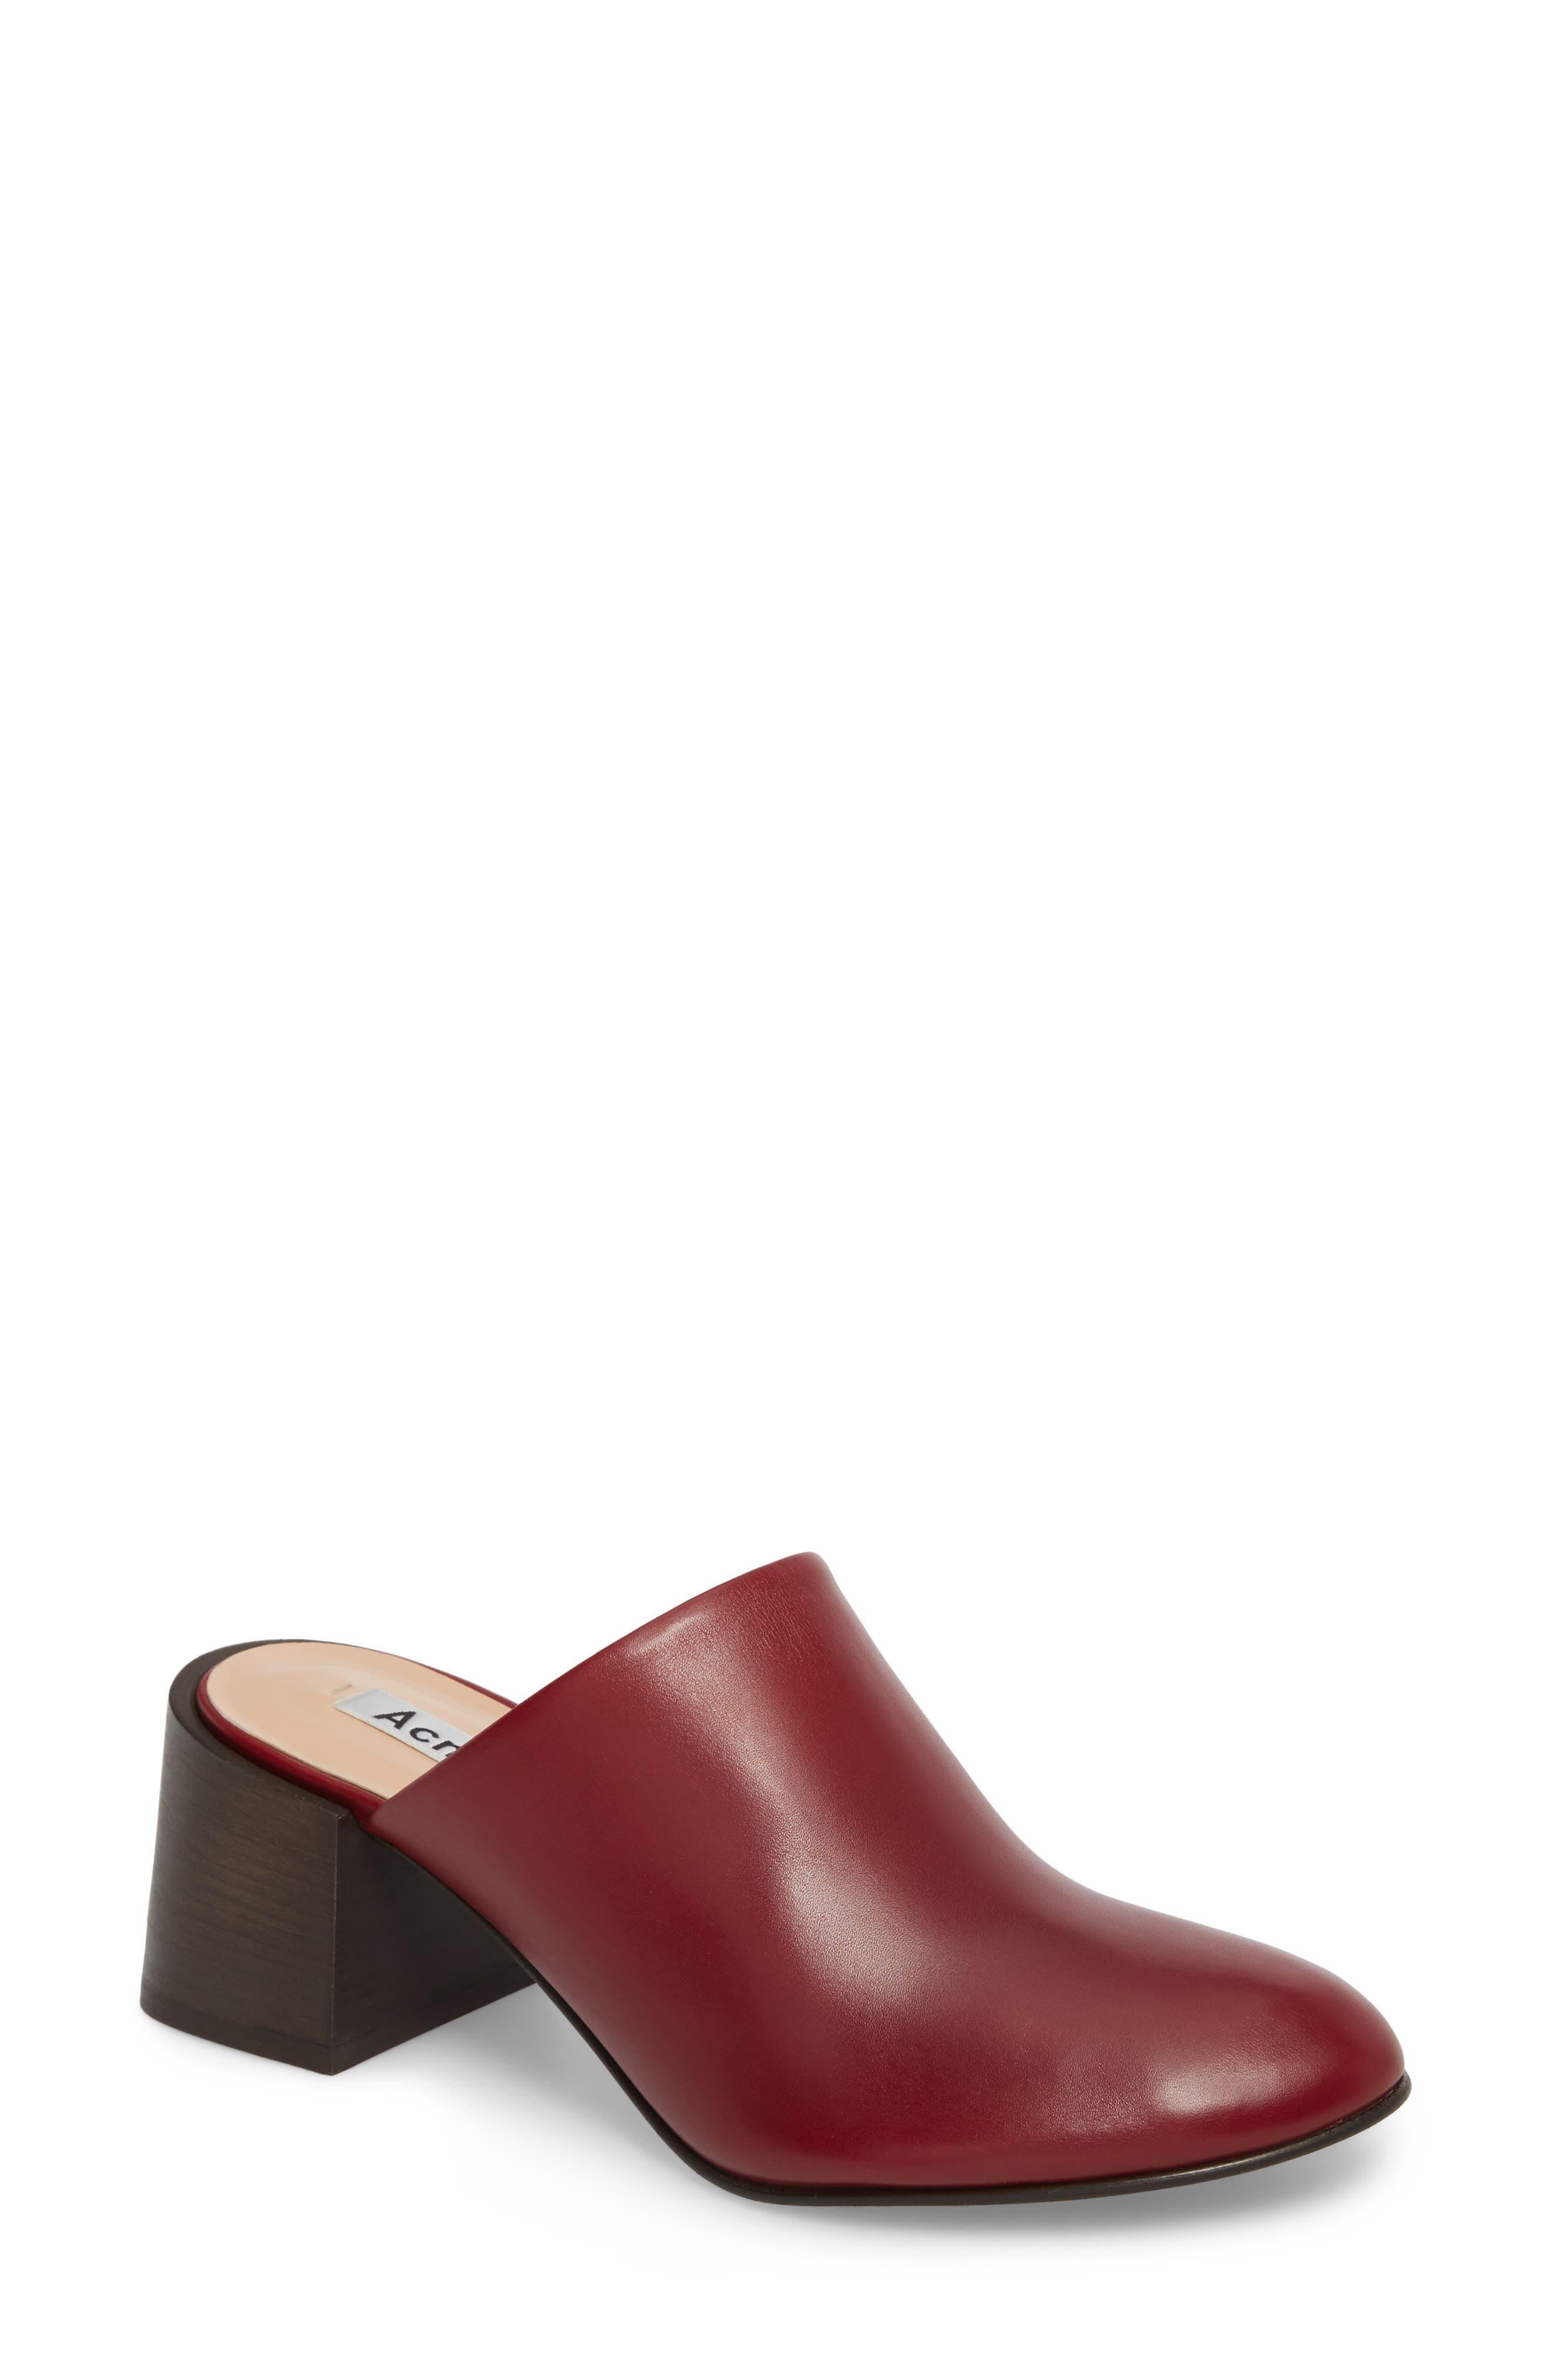 Sil Block Heel Mule,                         Main,                         color, Red Wine